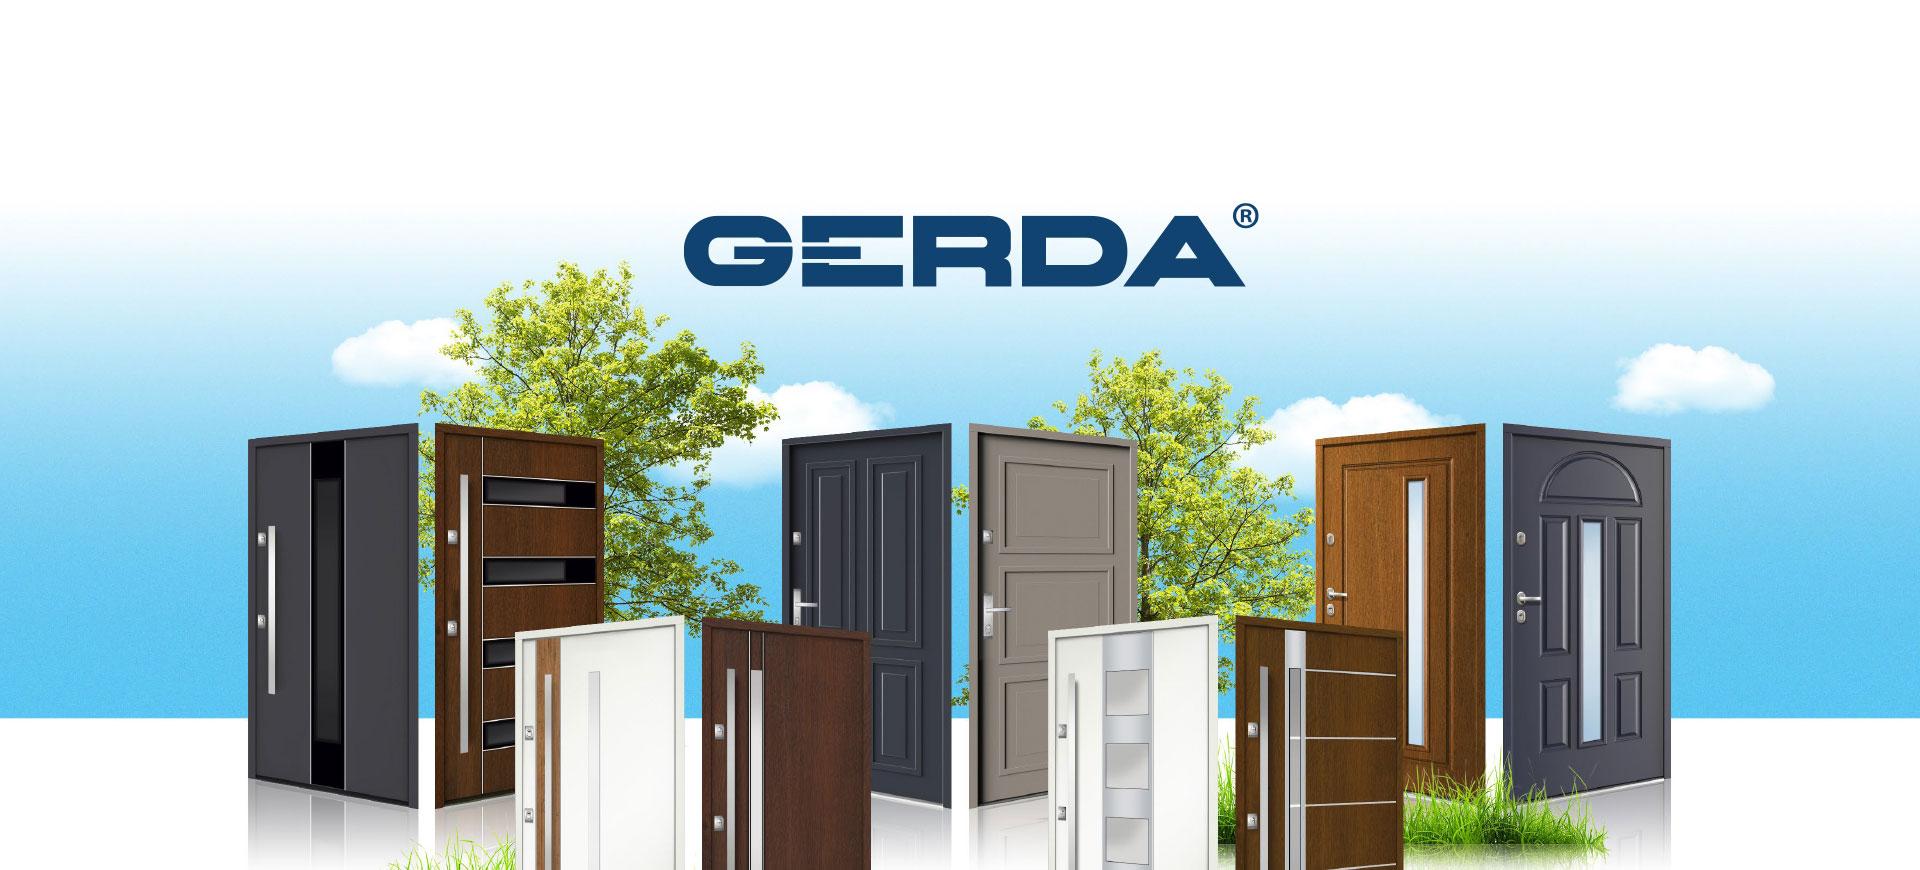 Gerda - nasz klient - projekty EMENEM studio